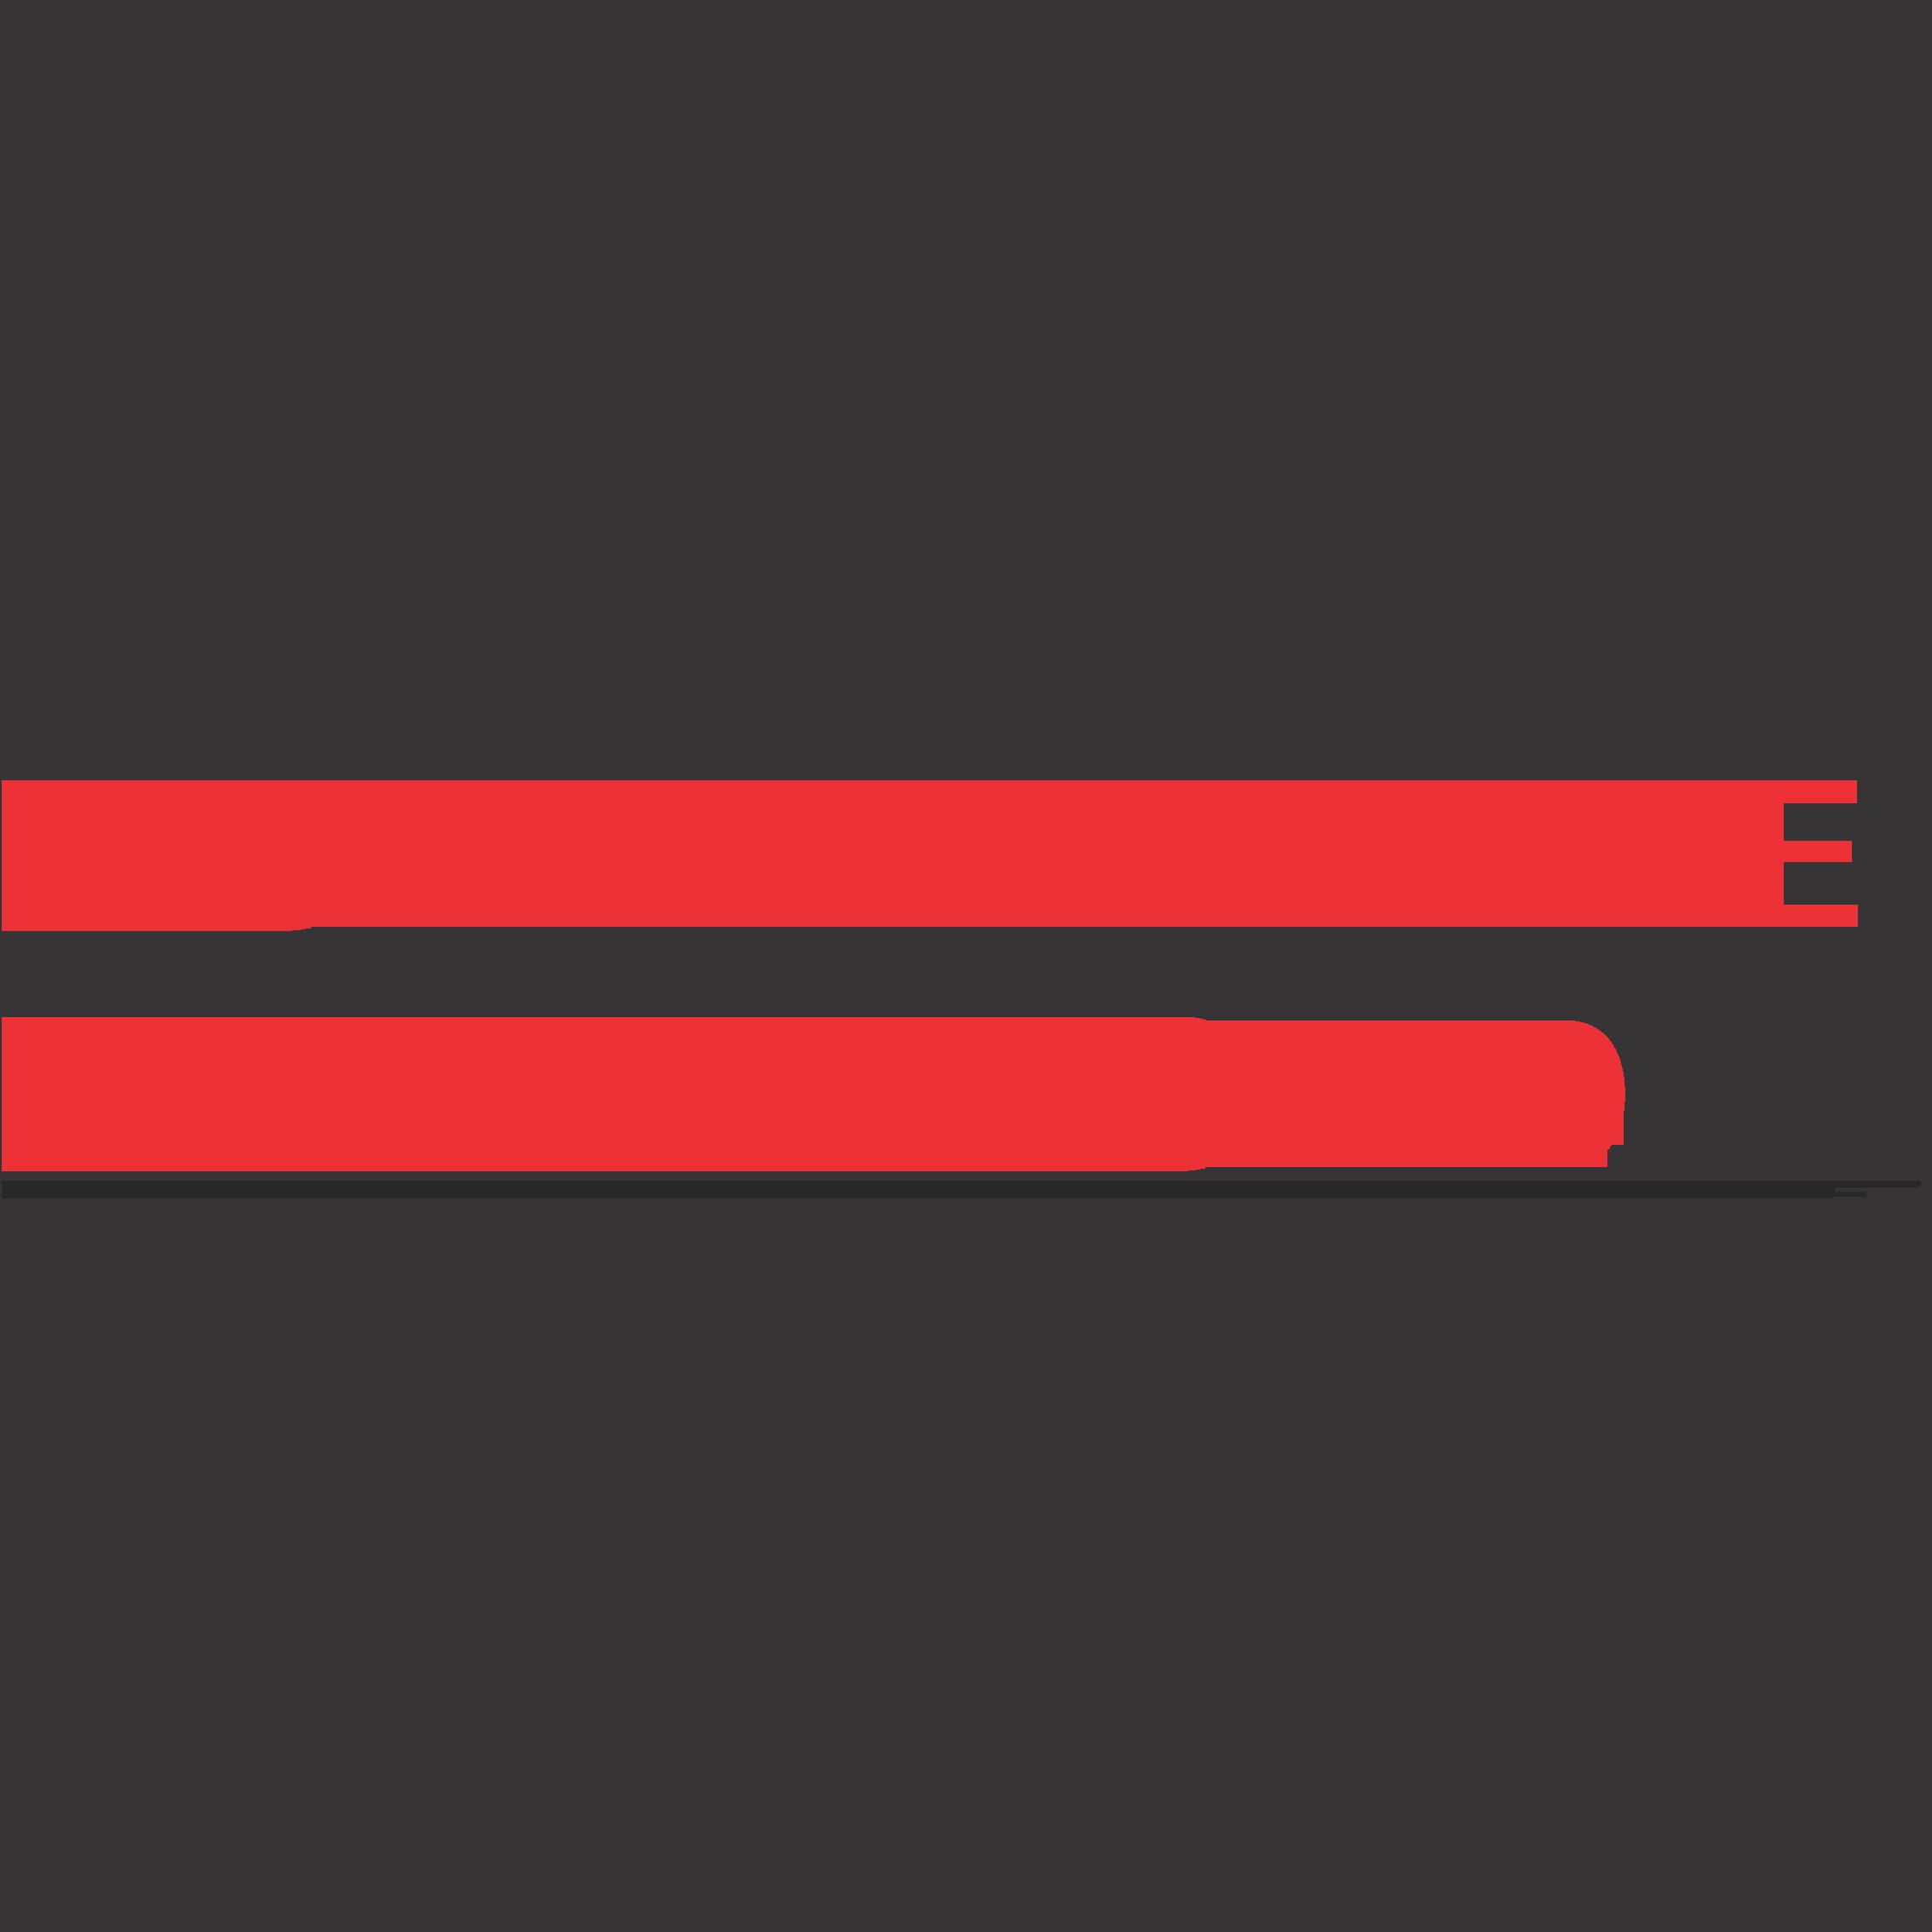 Miscellaneous Signs BUND DRAIN VALVE KEEP LOCKED